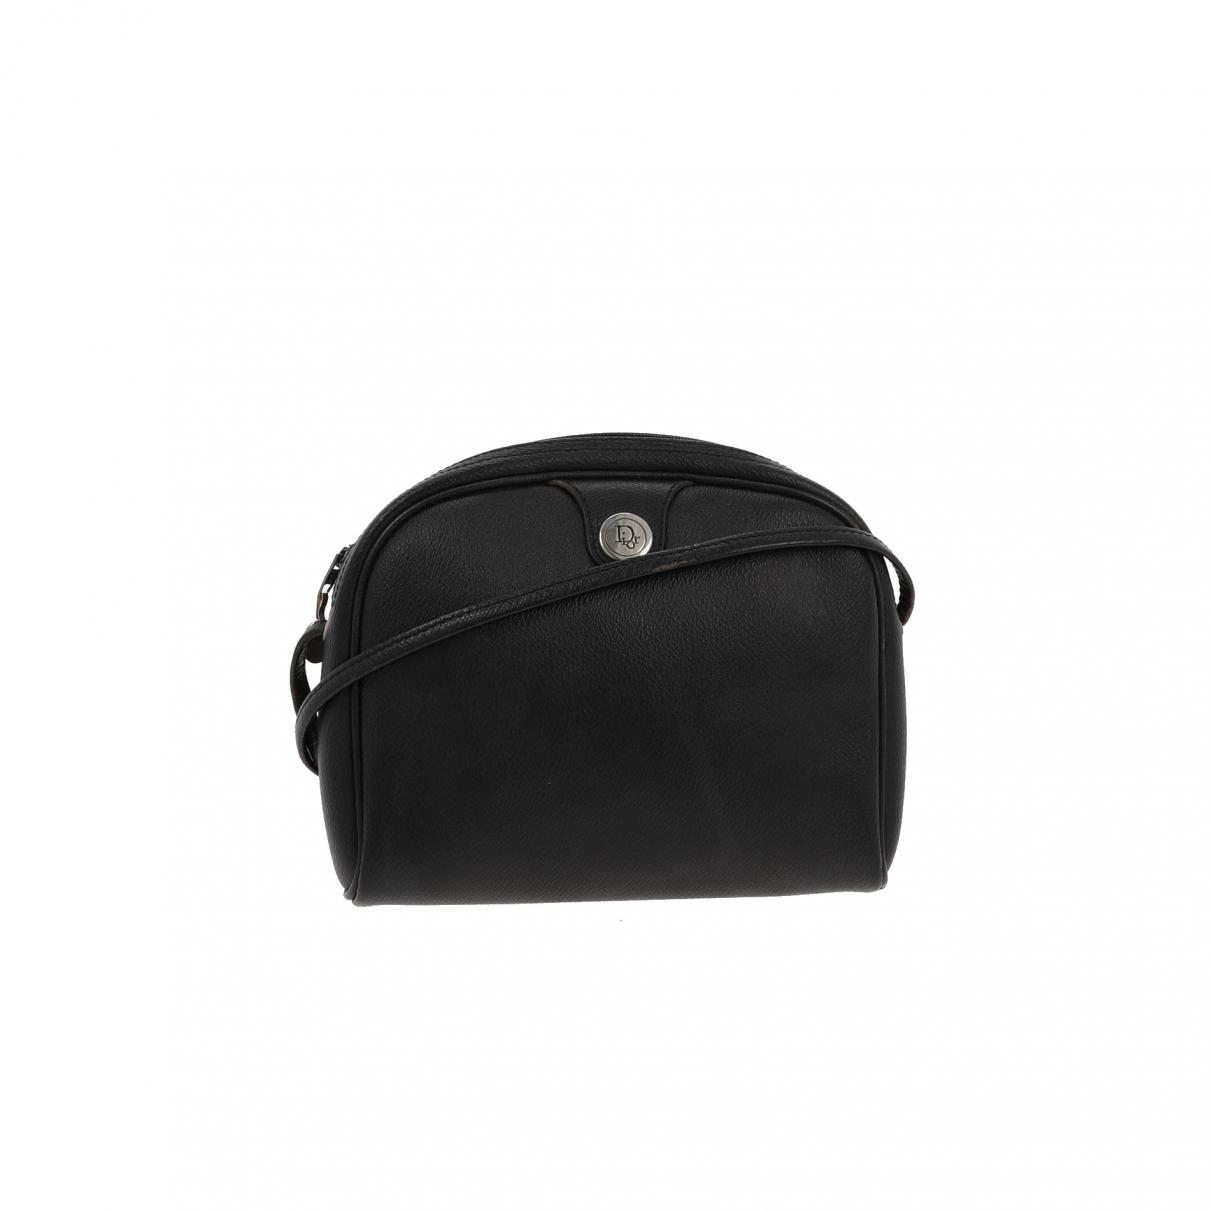 Dior - Sac a main   pour femme en cuir - noir